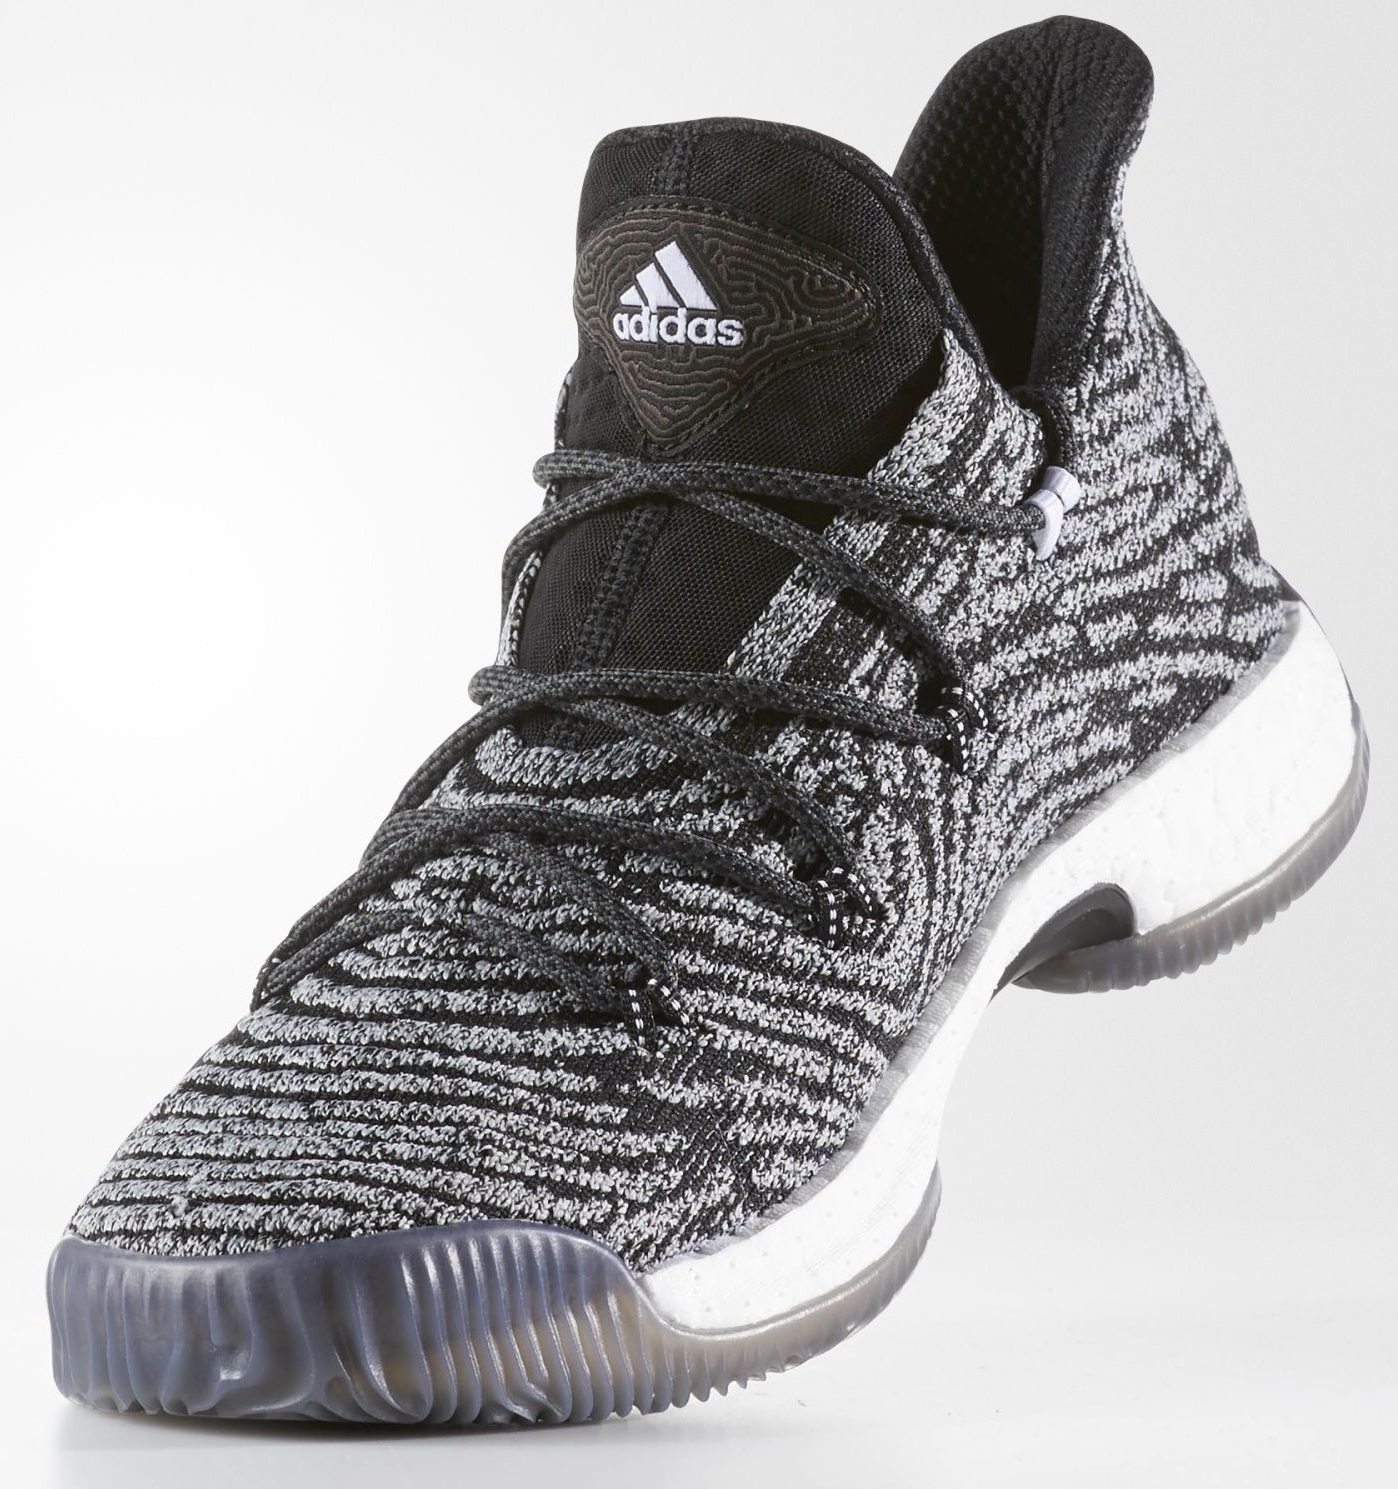 Adidas Crazy Explosive Low Primeknit Review